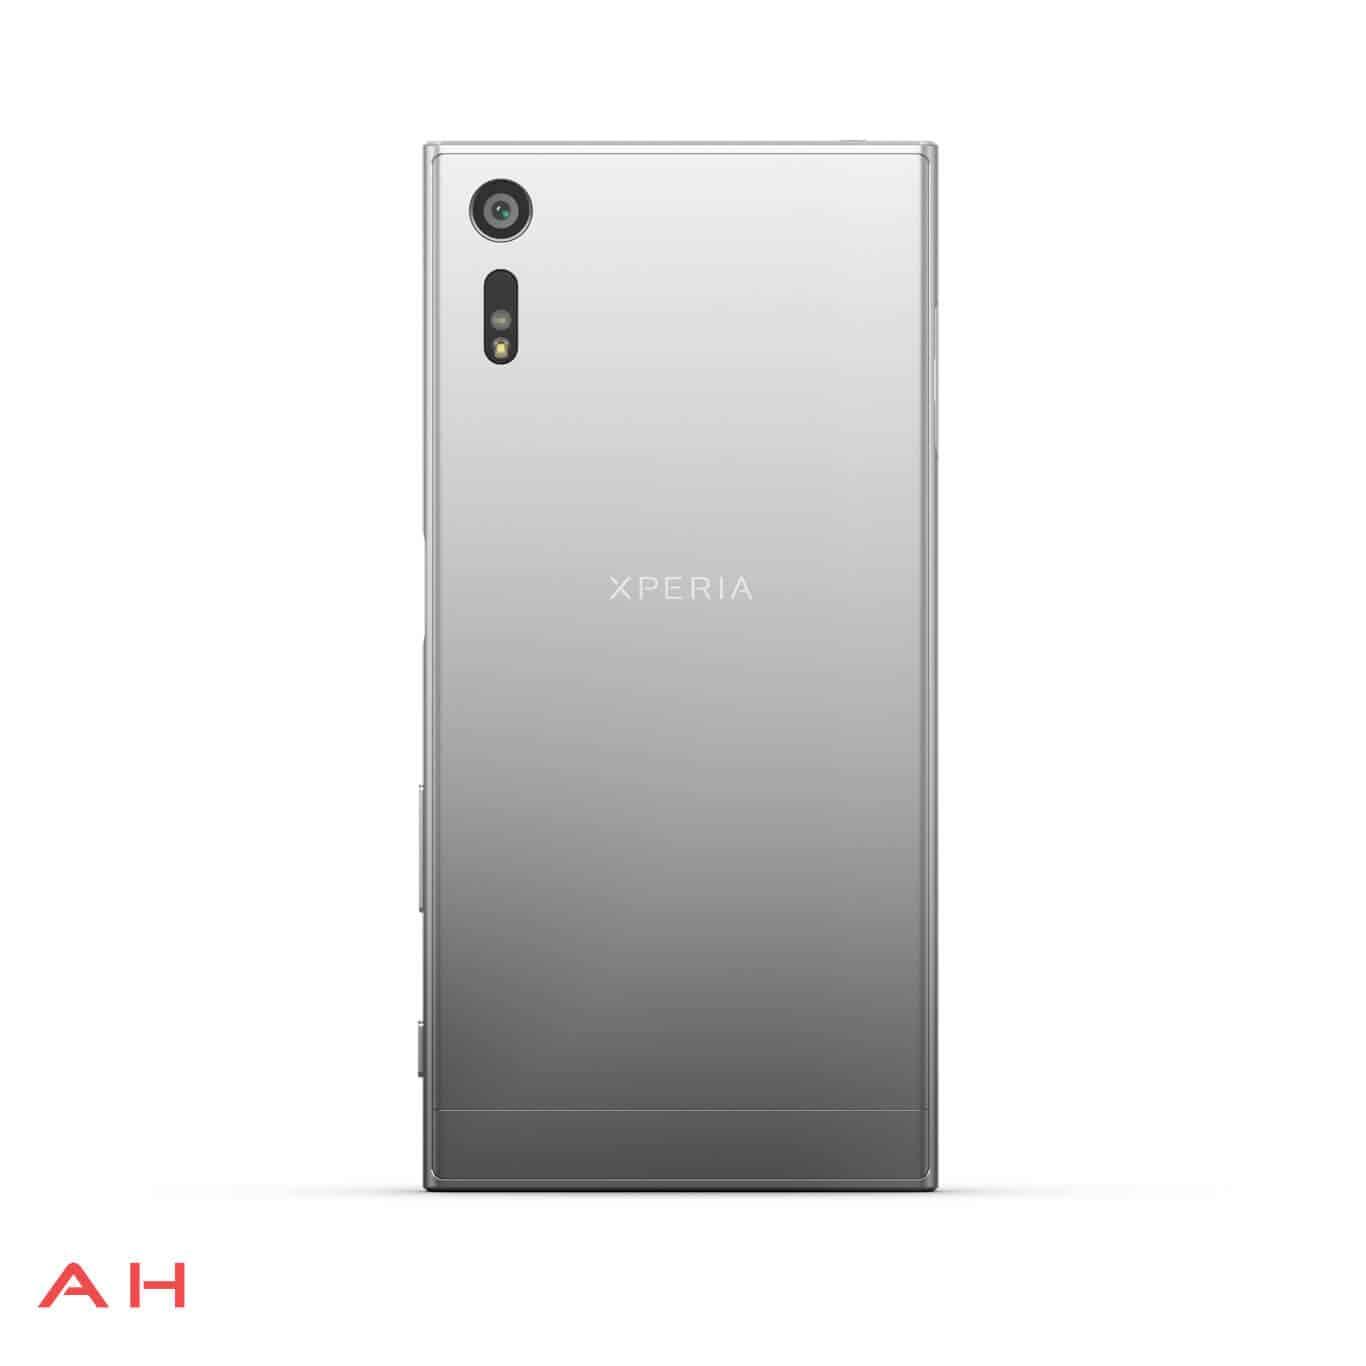 Sony Xperia XZ AH 5